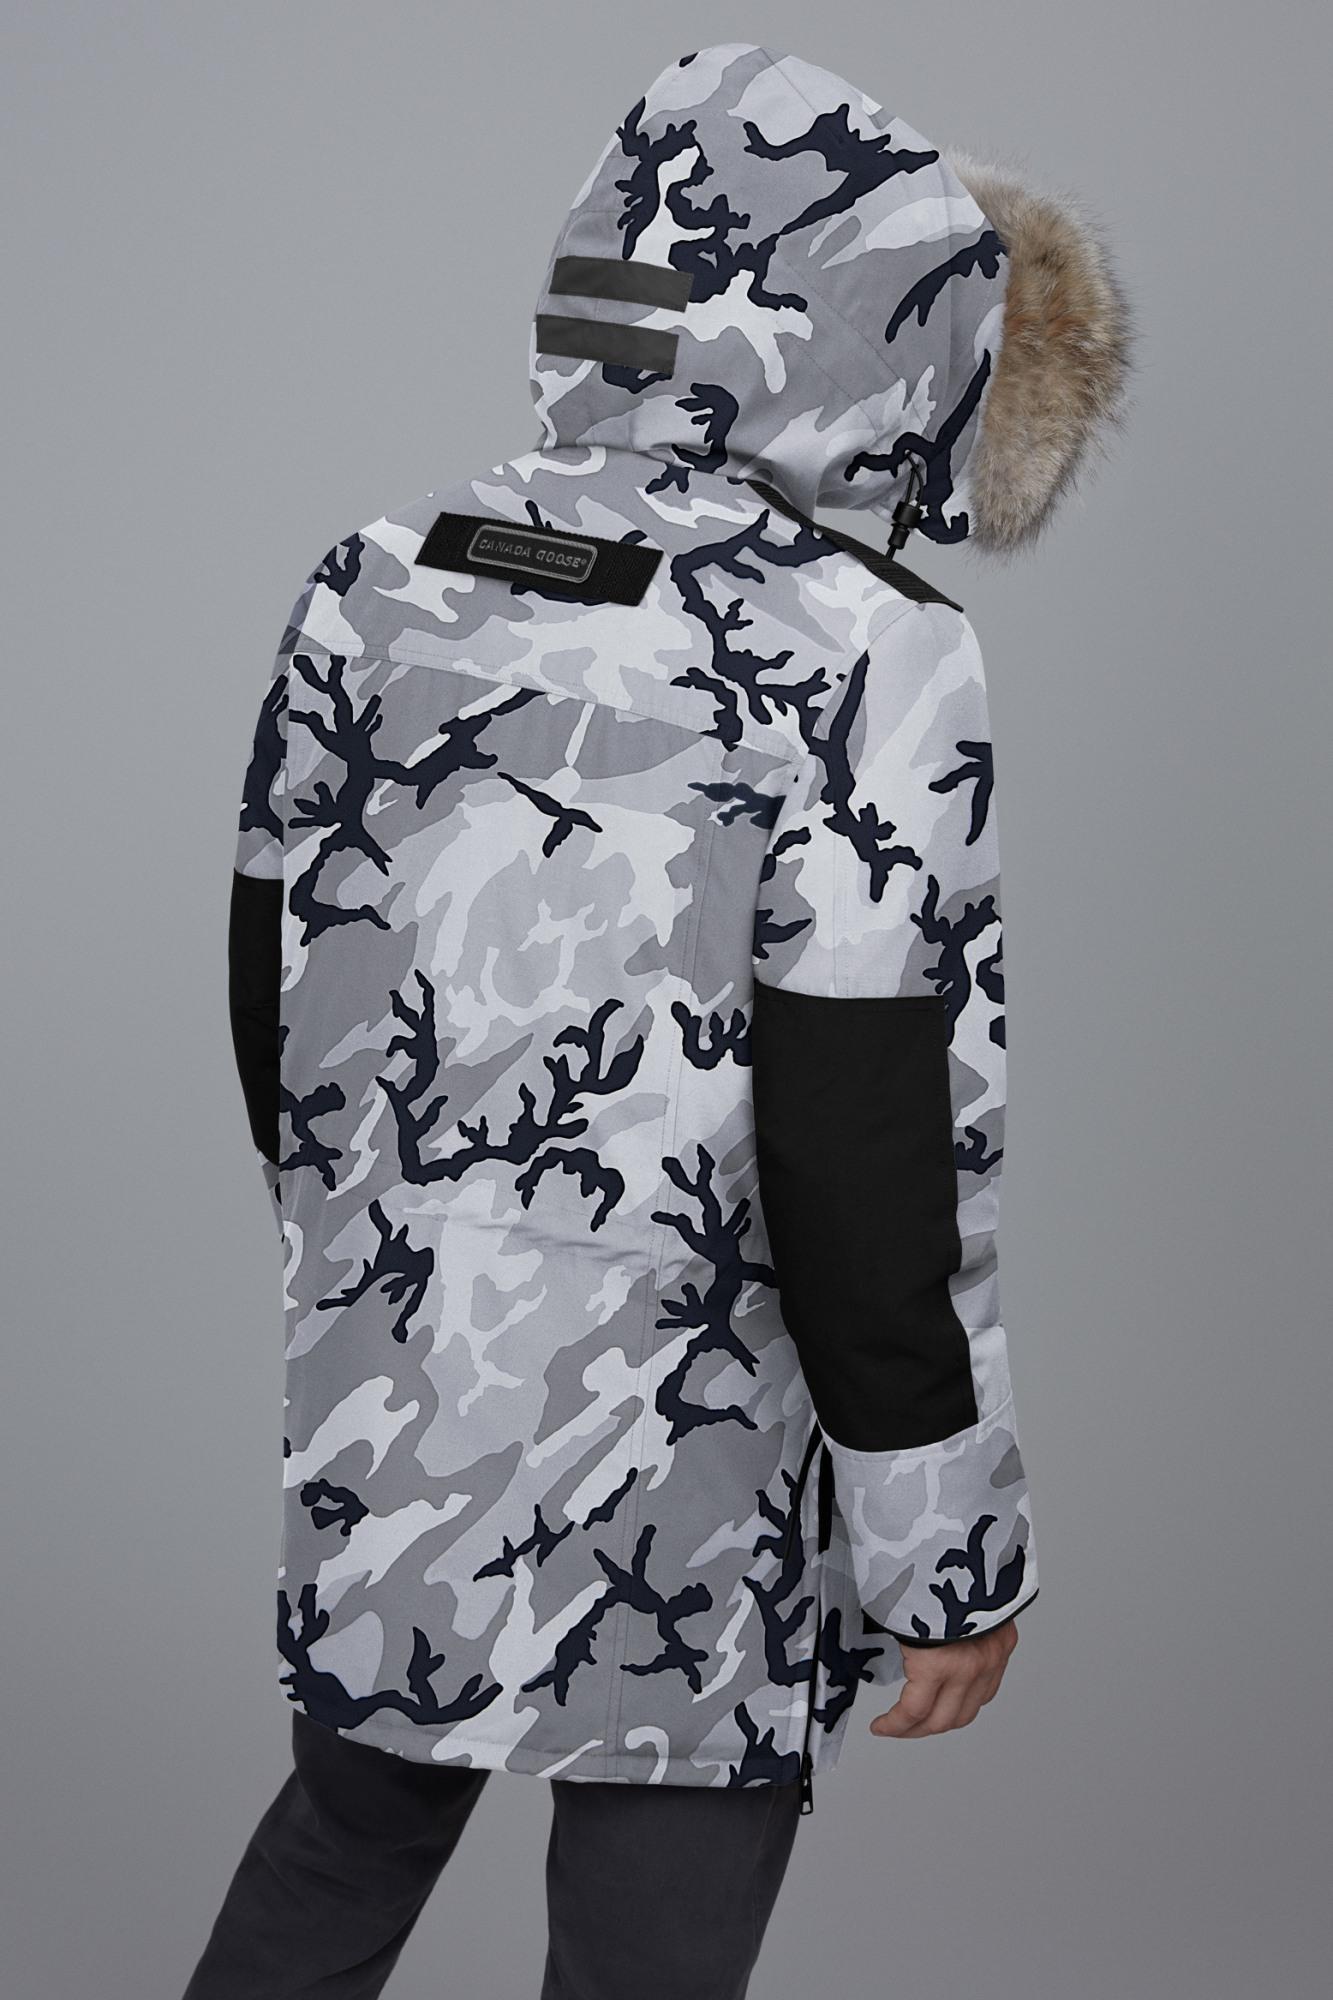 Details about Macculloch Canada Goose mens camo jacket medium